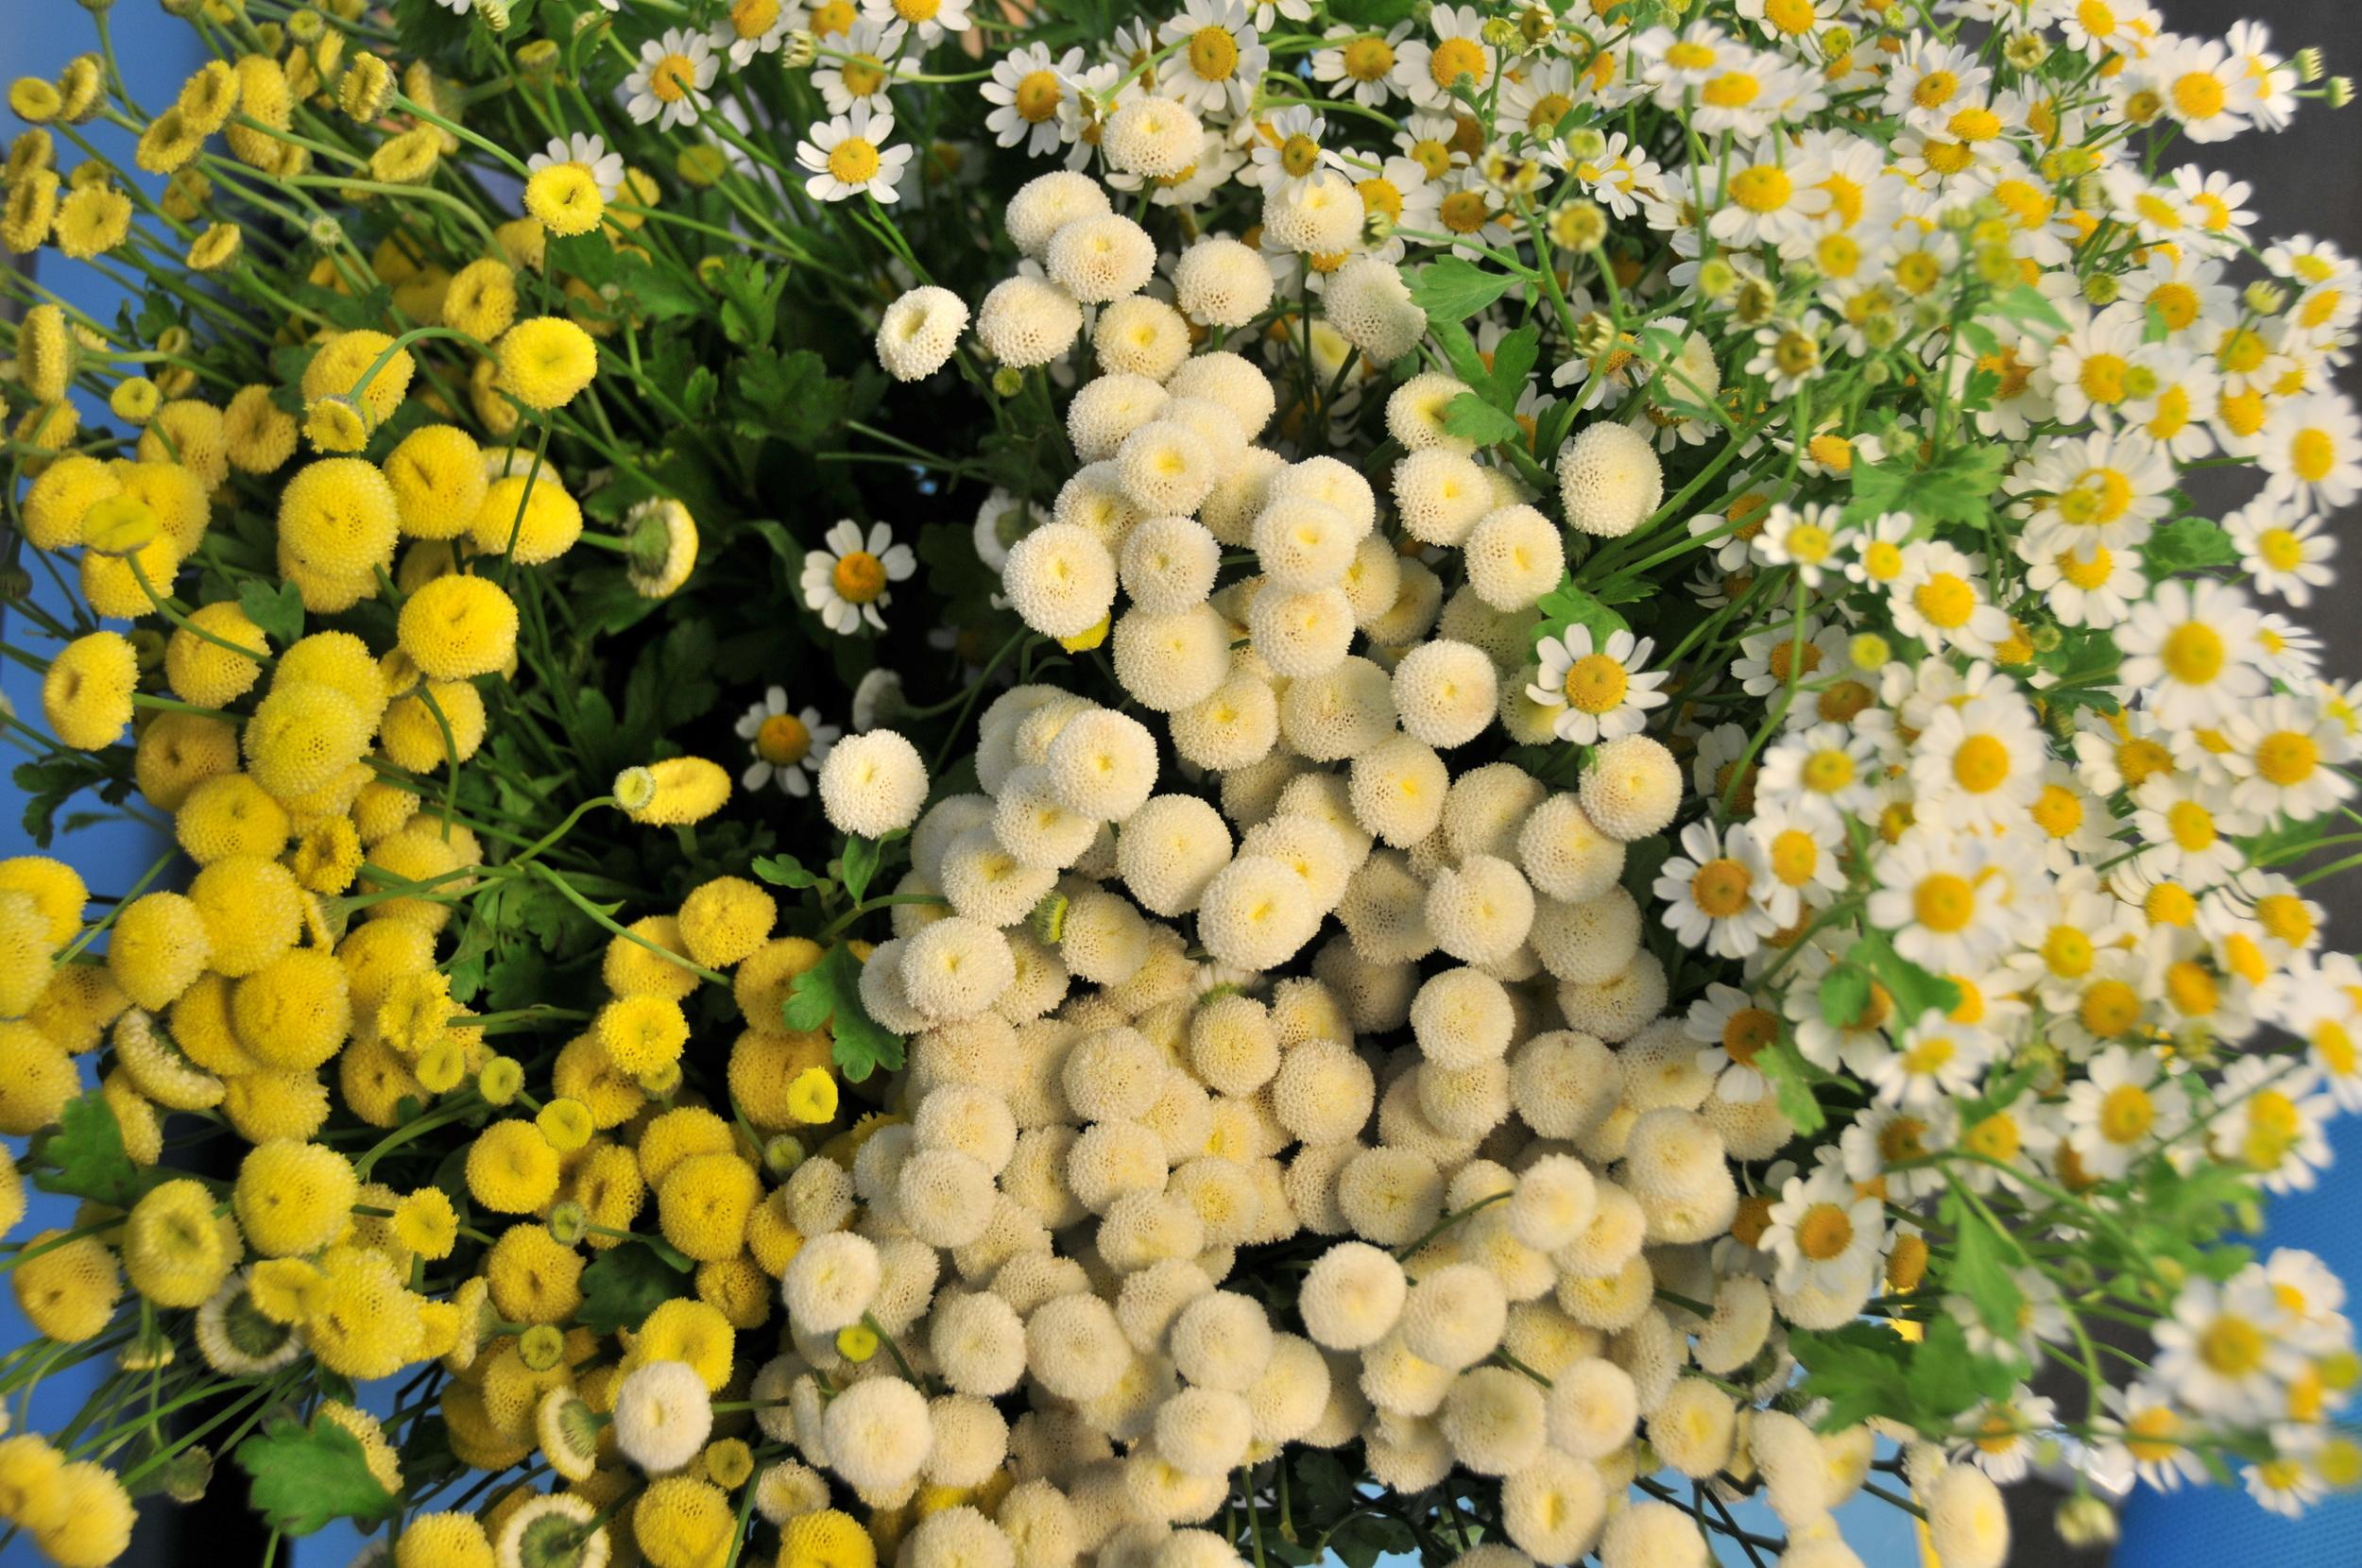 (L-R): Yellow Button, White Button, and White Daisy Matricaria